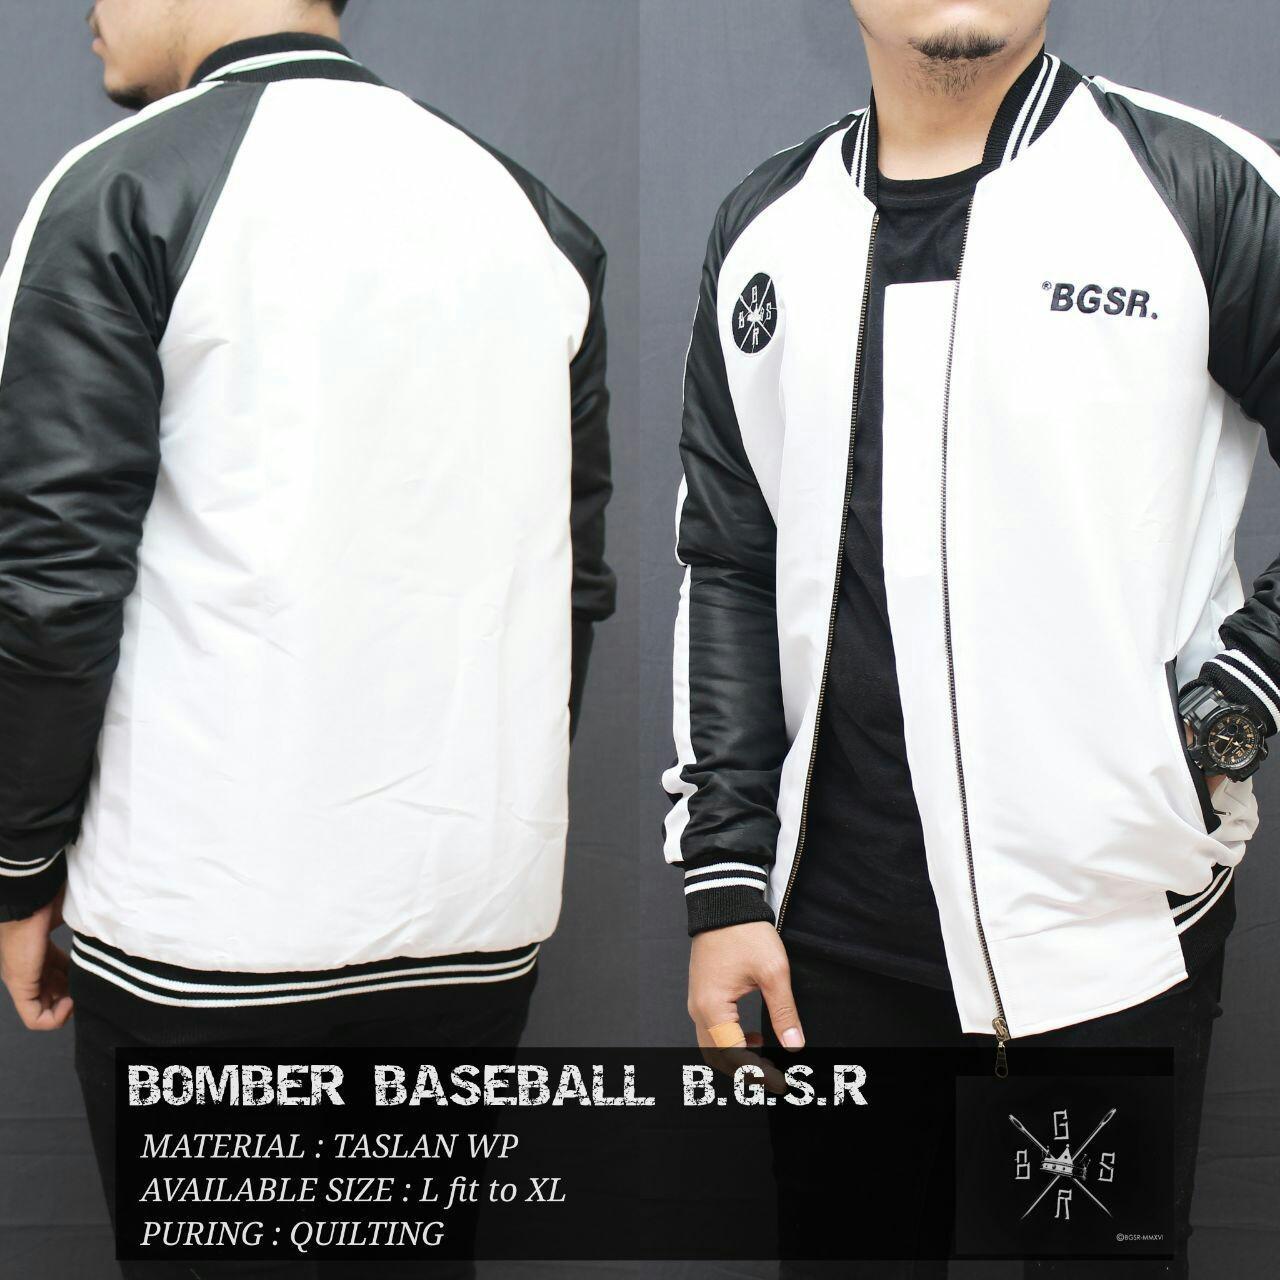 Bomber Baseball Bgsr Best Er. Atta Clothing / fashion pria / pakaian .